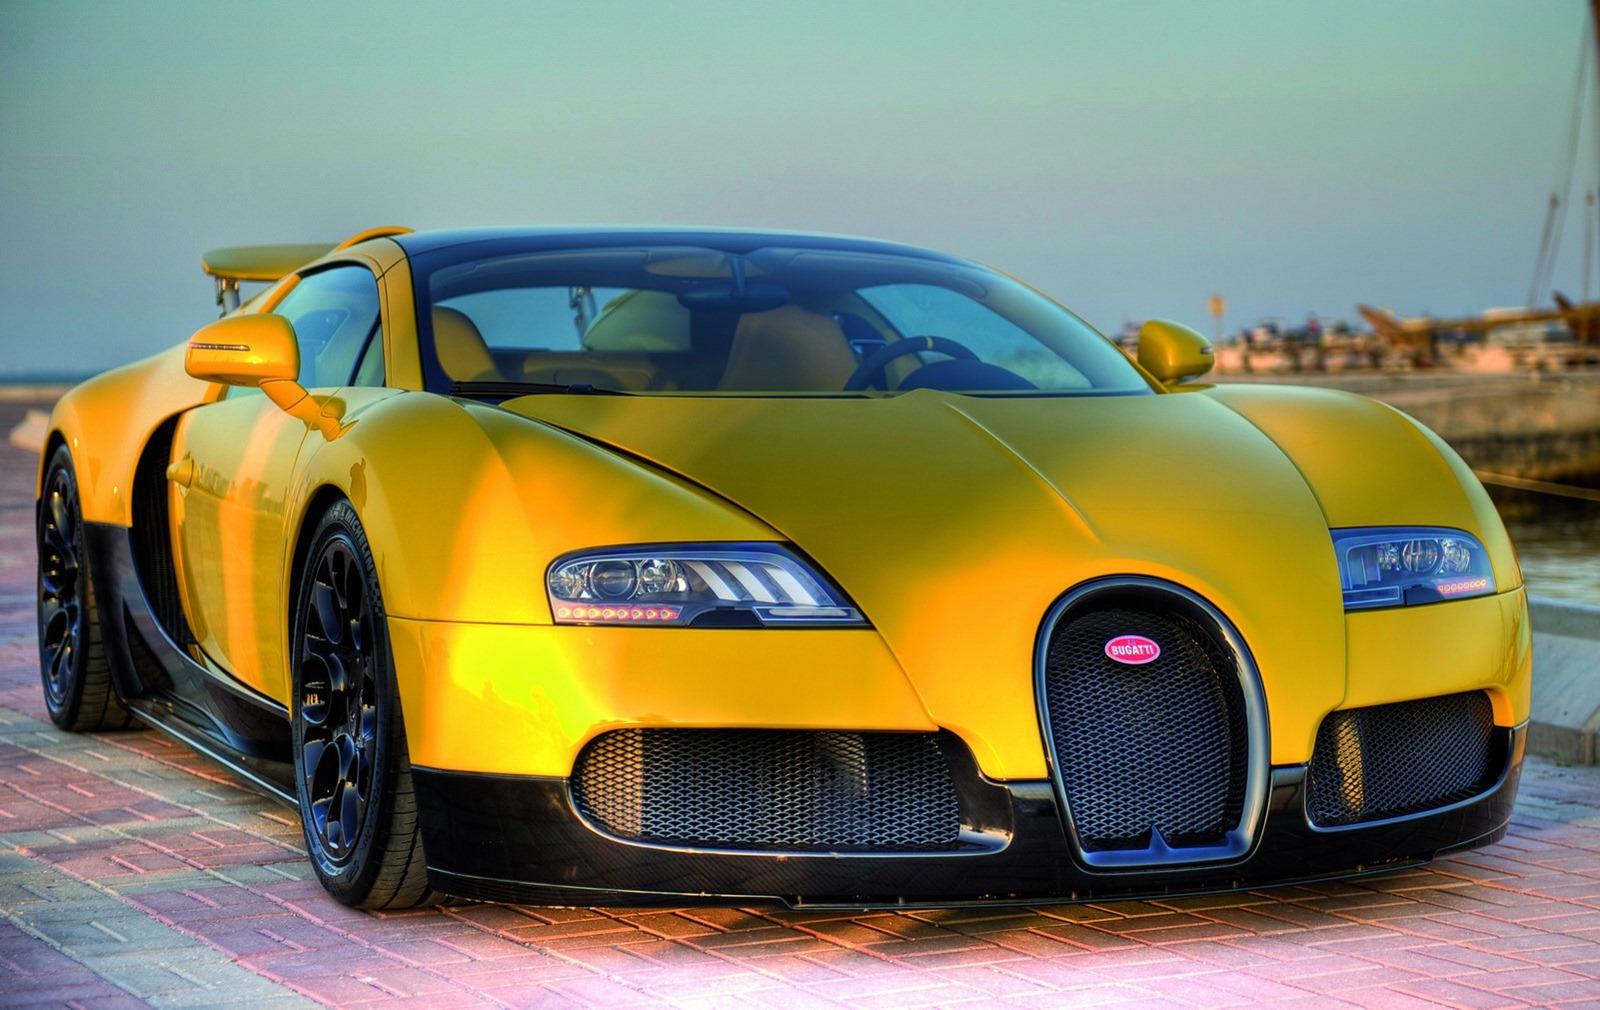 [Bugatti-Veyron-Grand-Sport-13%255B2%255D%255B2%255D.jpg]